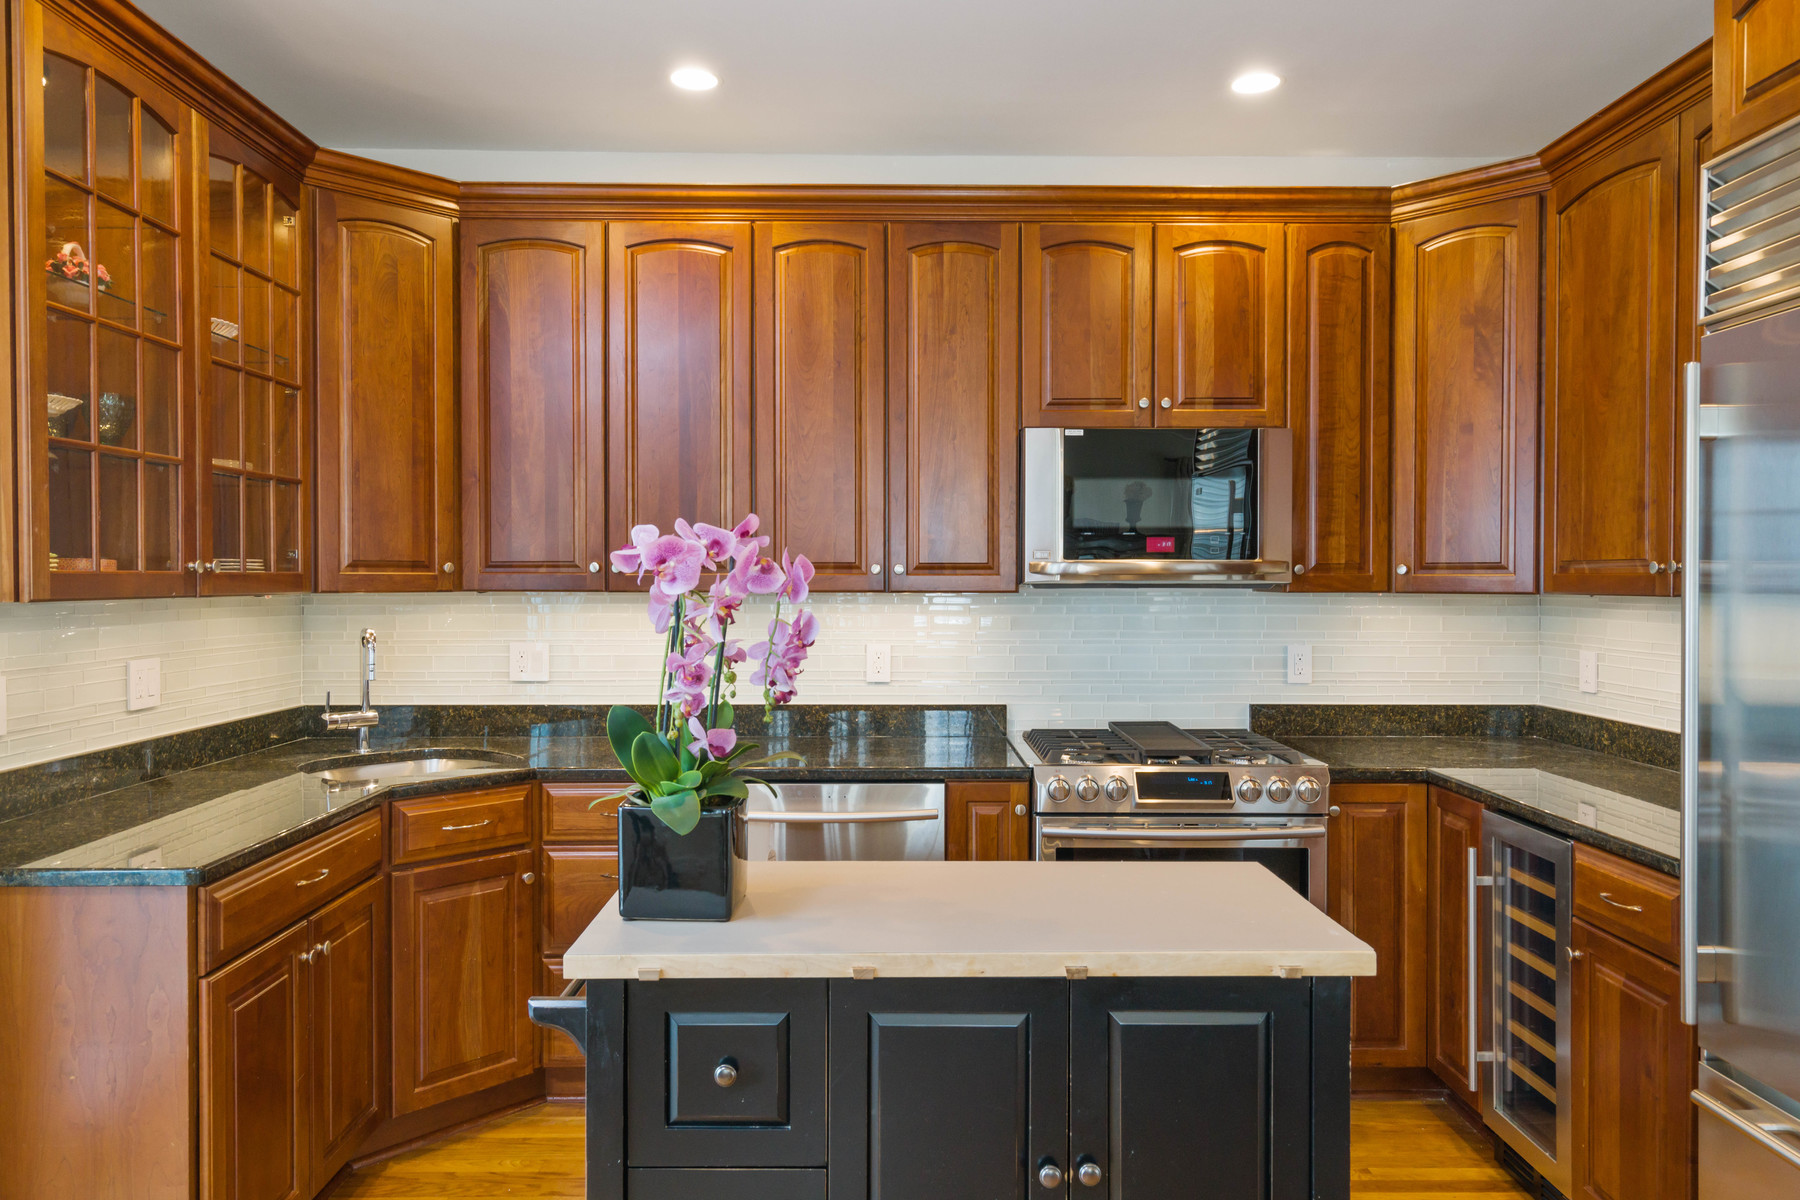 Single Family Home for Sale at 402 E 3rd 402 E 3rd Street Boston, Massachusetts, 02127 United States